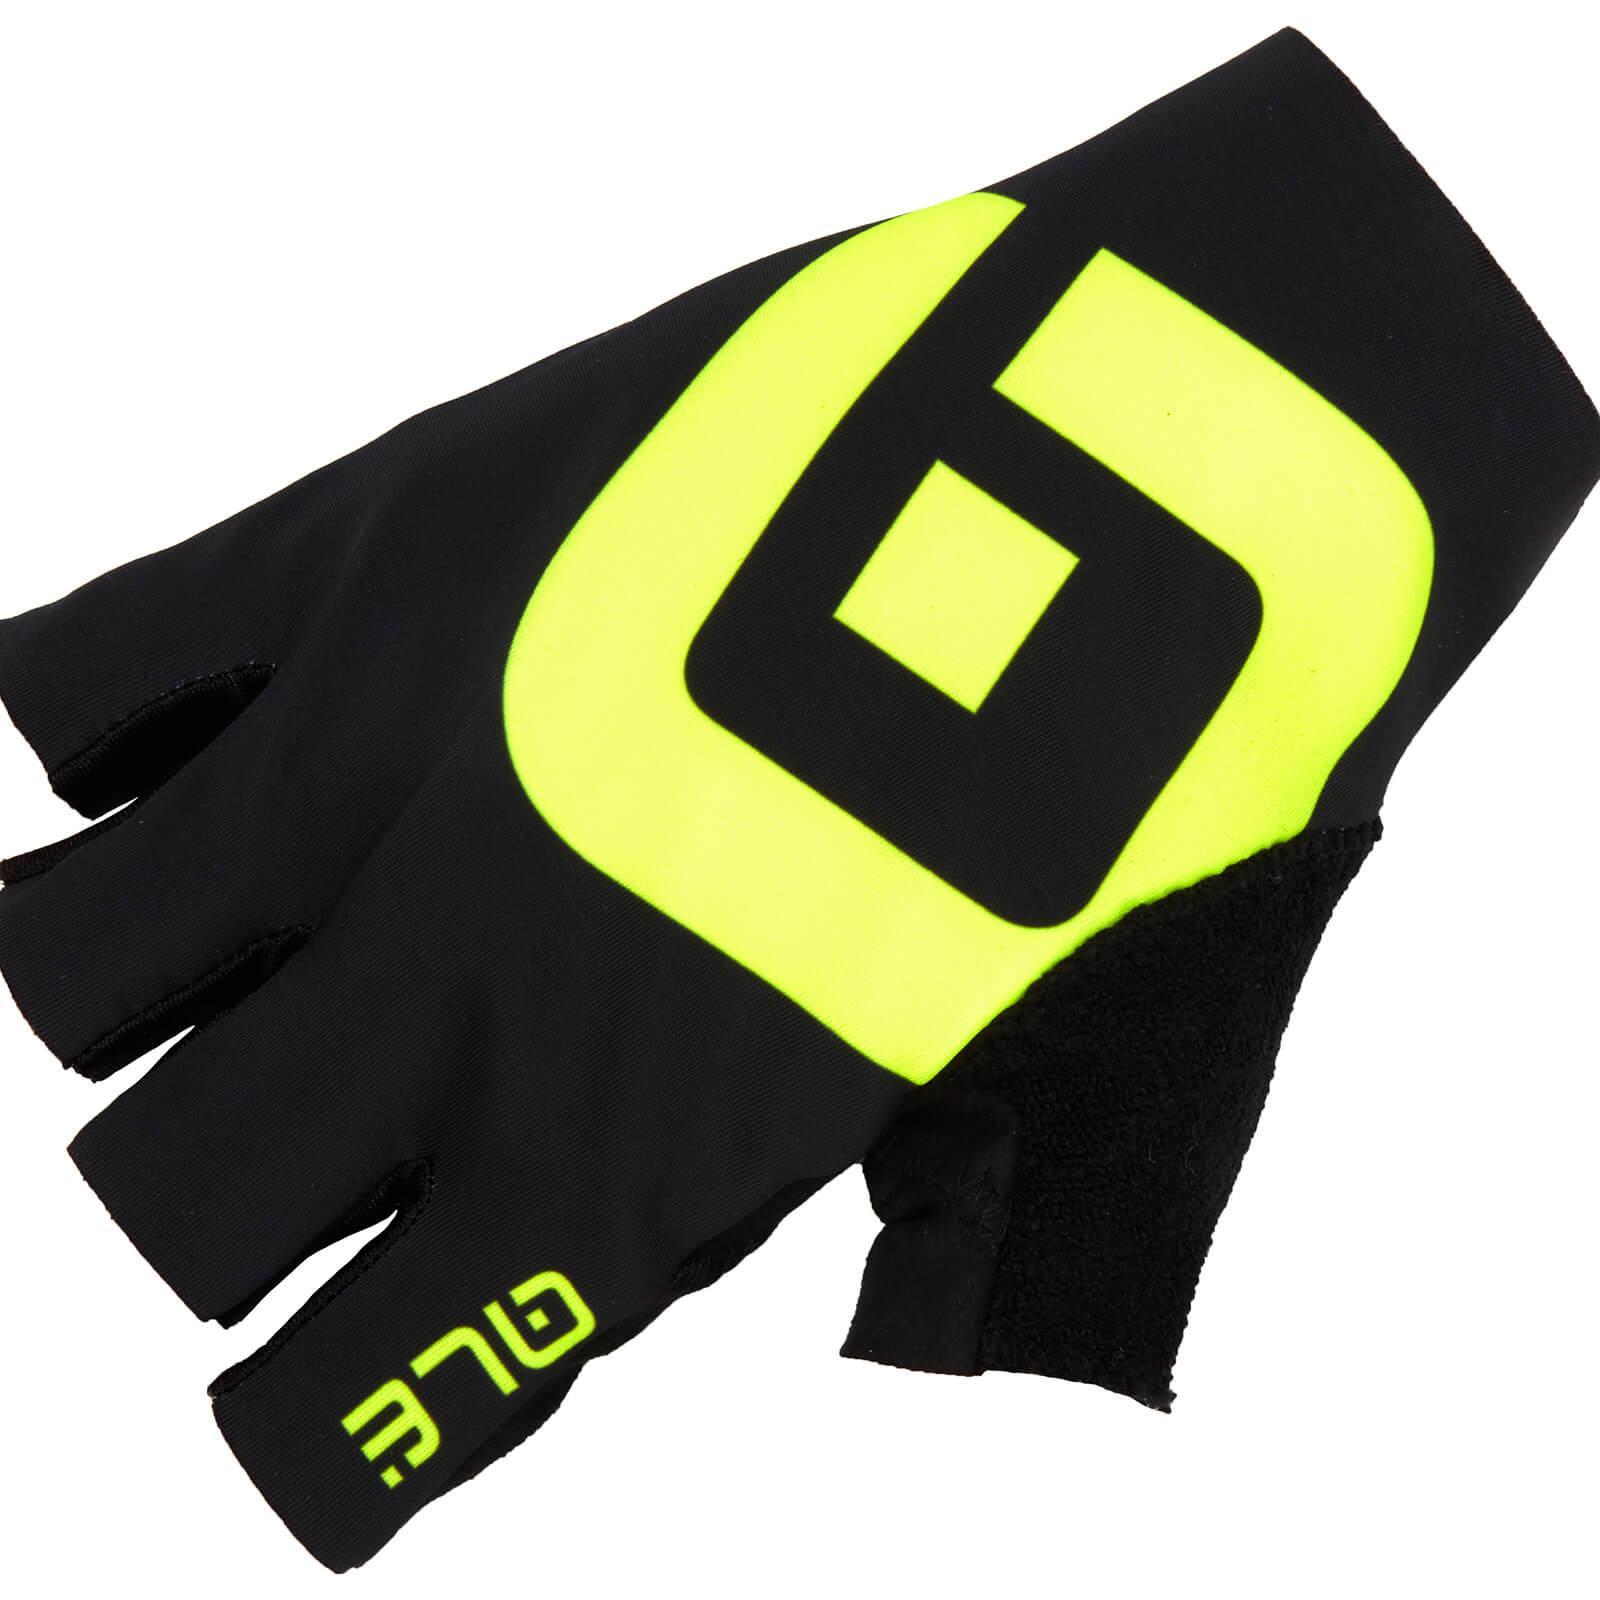 Al Air Gloves - M - Black/fluo Yellow